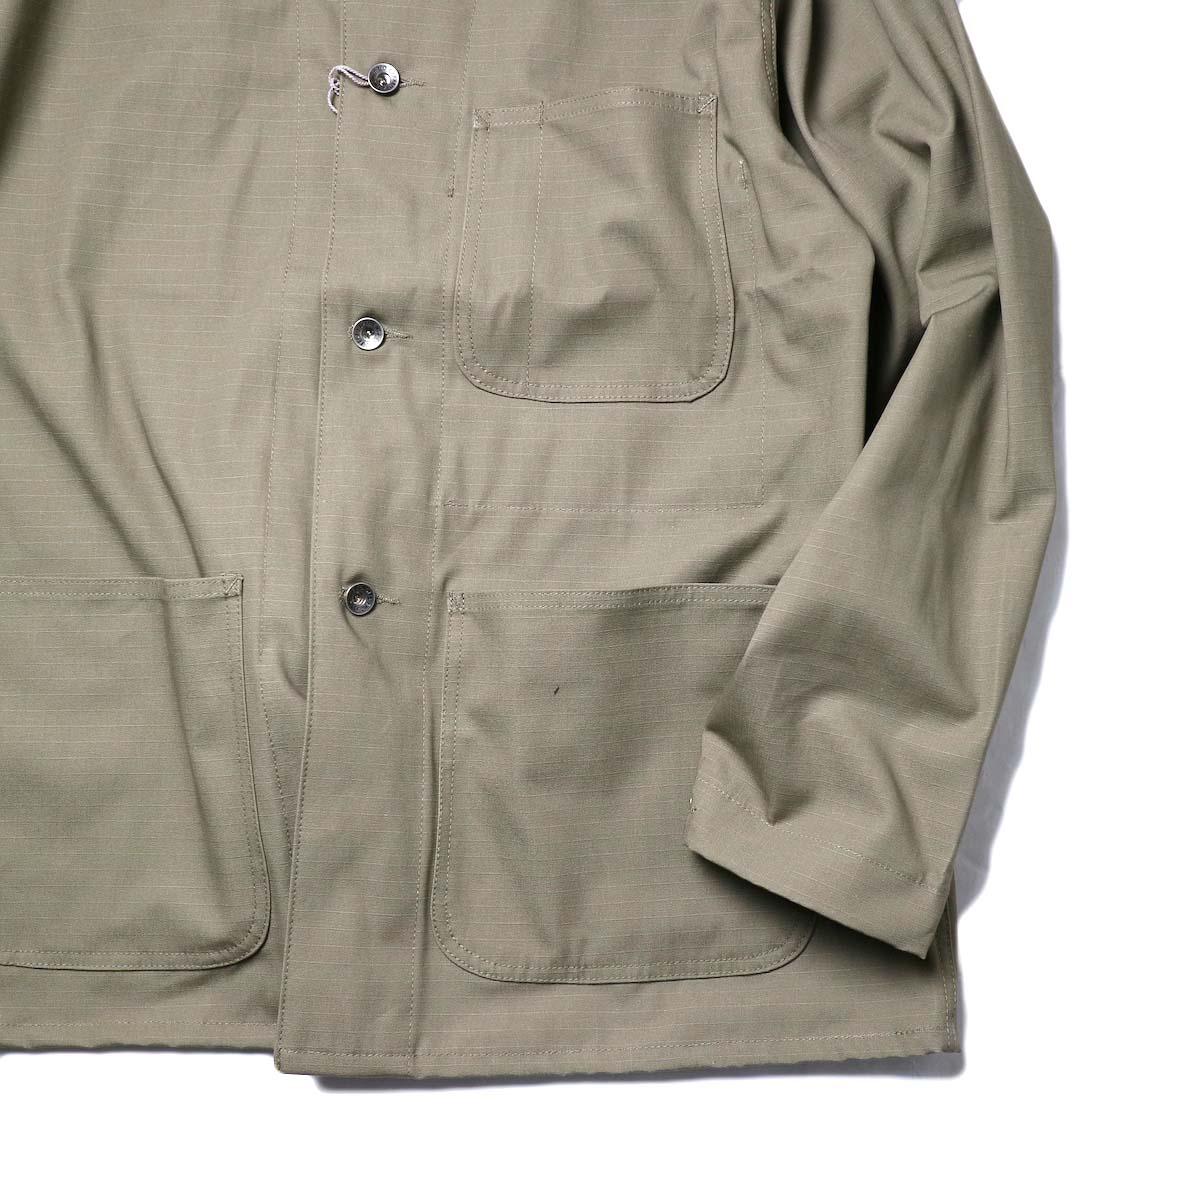 Engineered Garments Workaday / Utility Jacket - Cotton Ripstop (Khaki)袖、裾